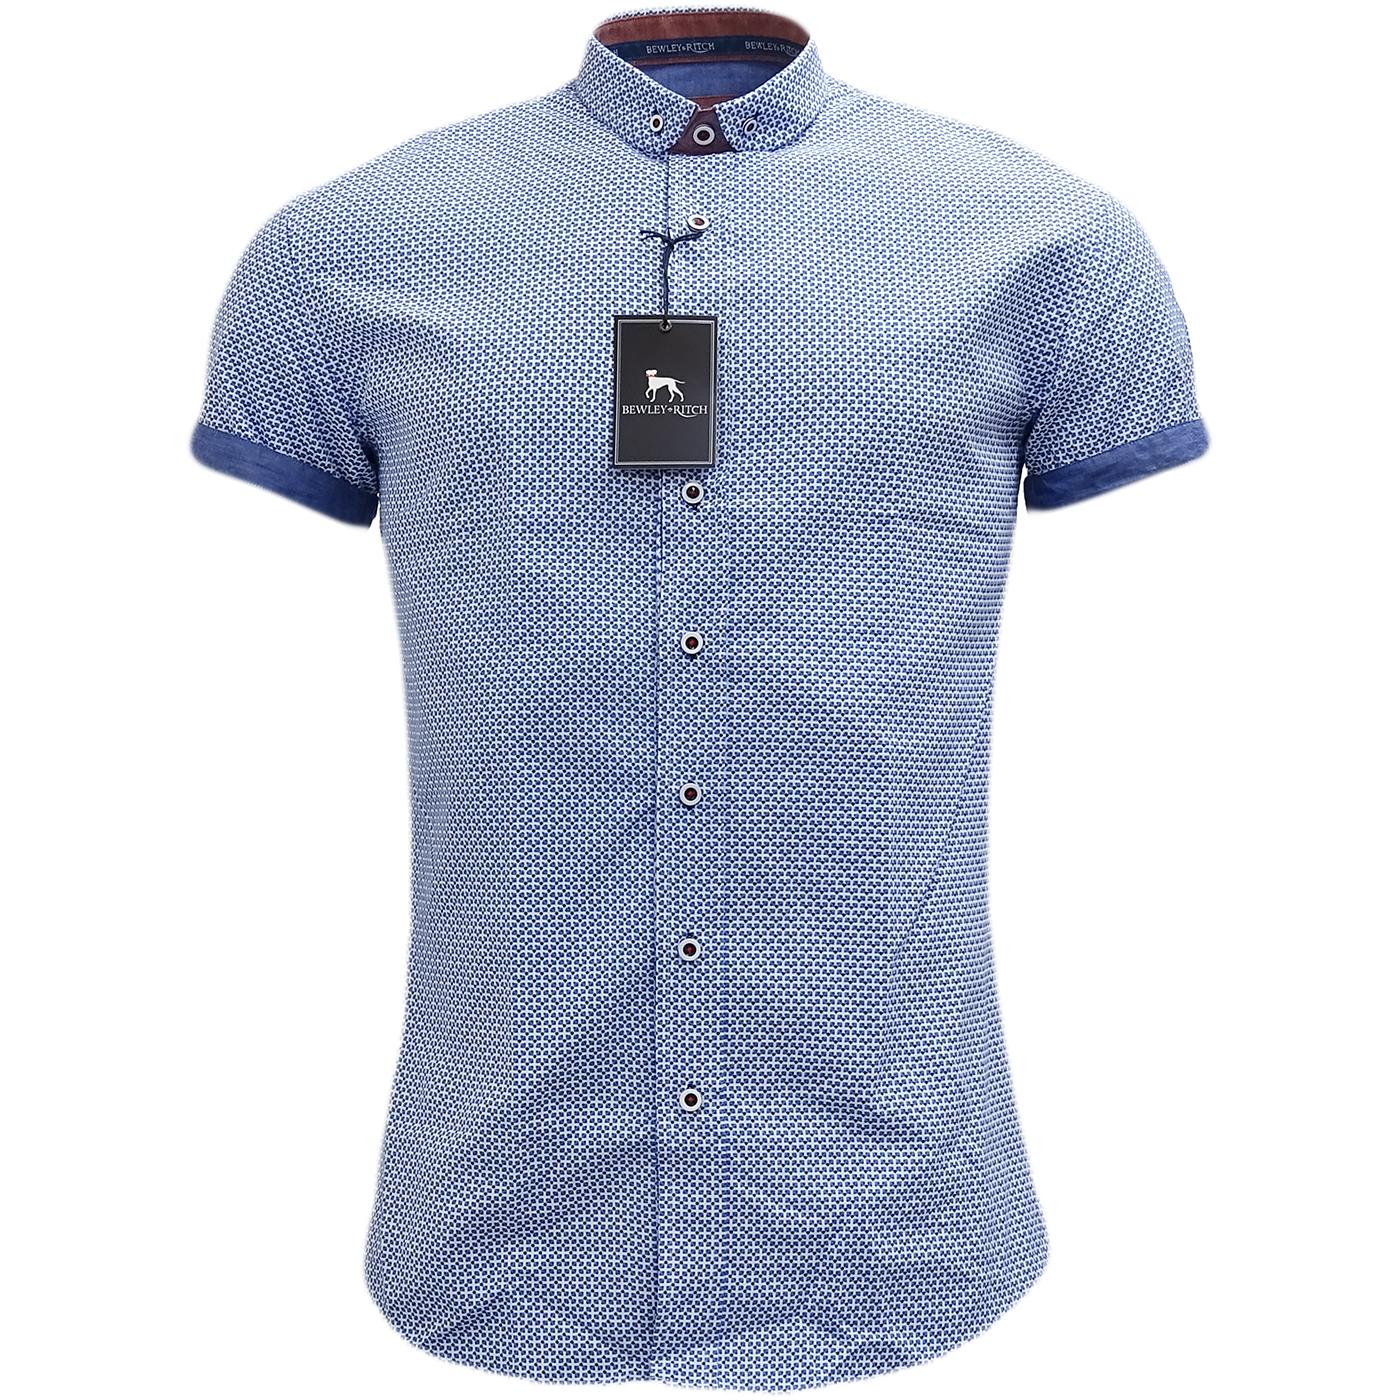 Bewley & Ritch Blue Slim Fit Button Down Mod / Retro Square Shirt